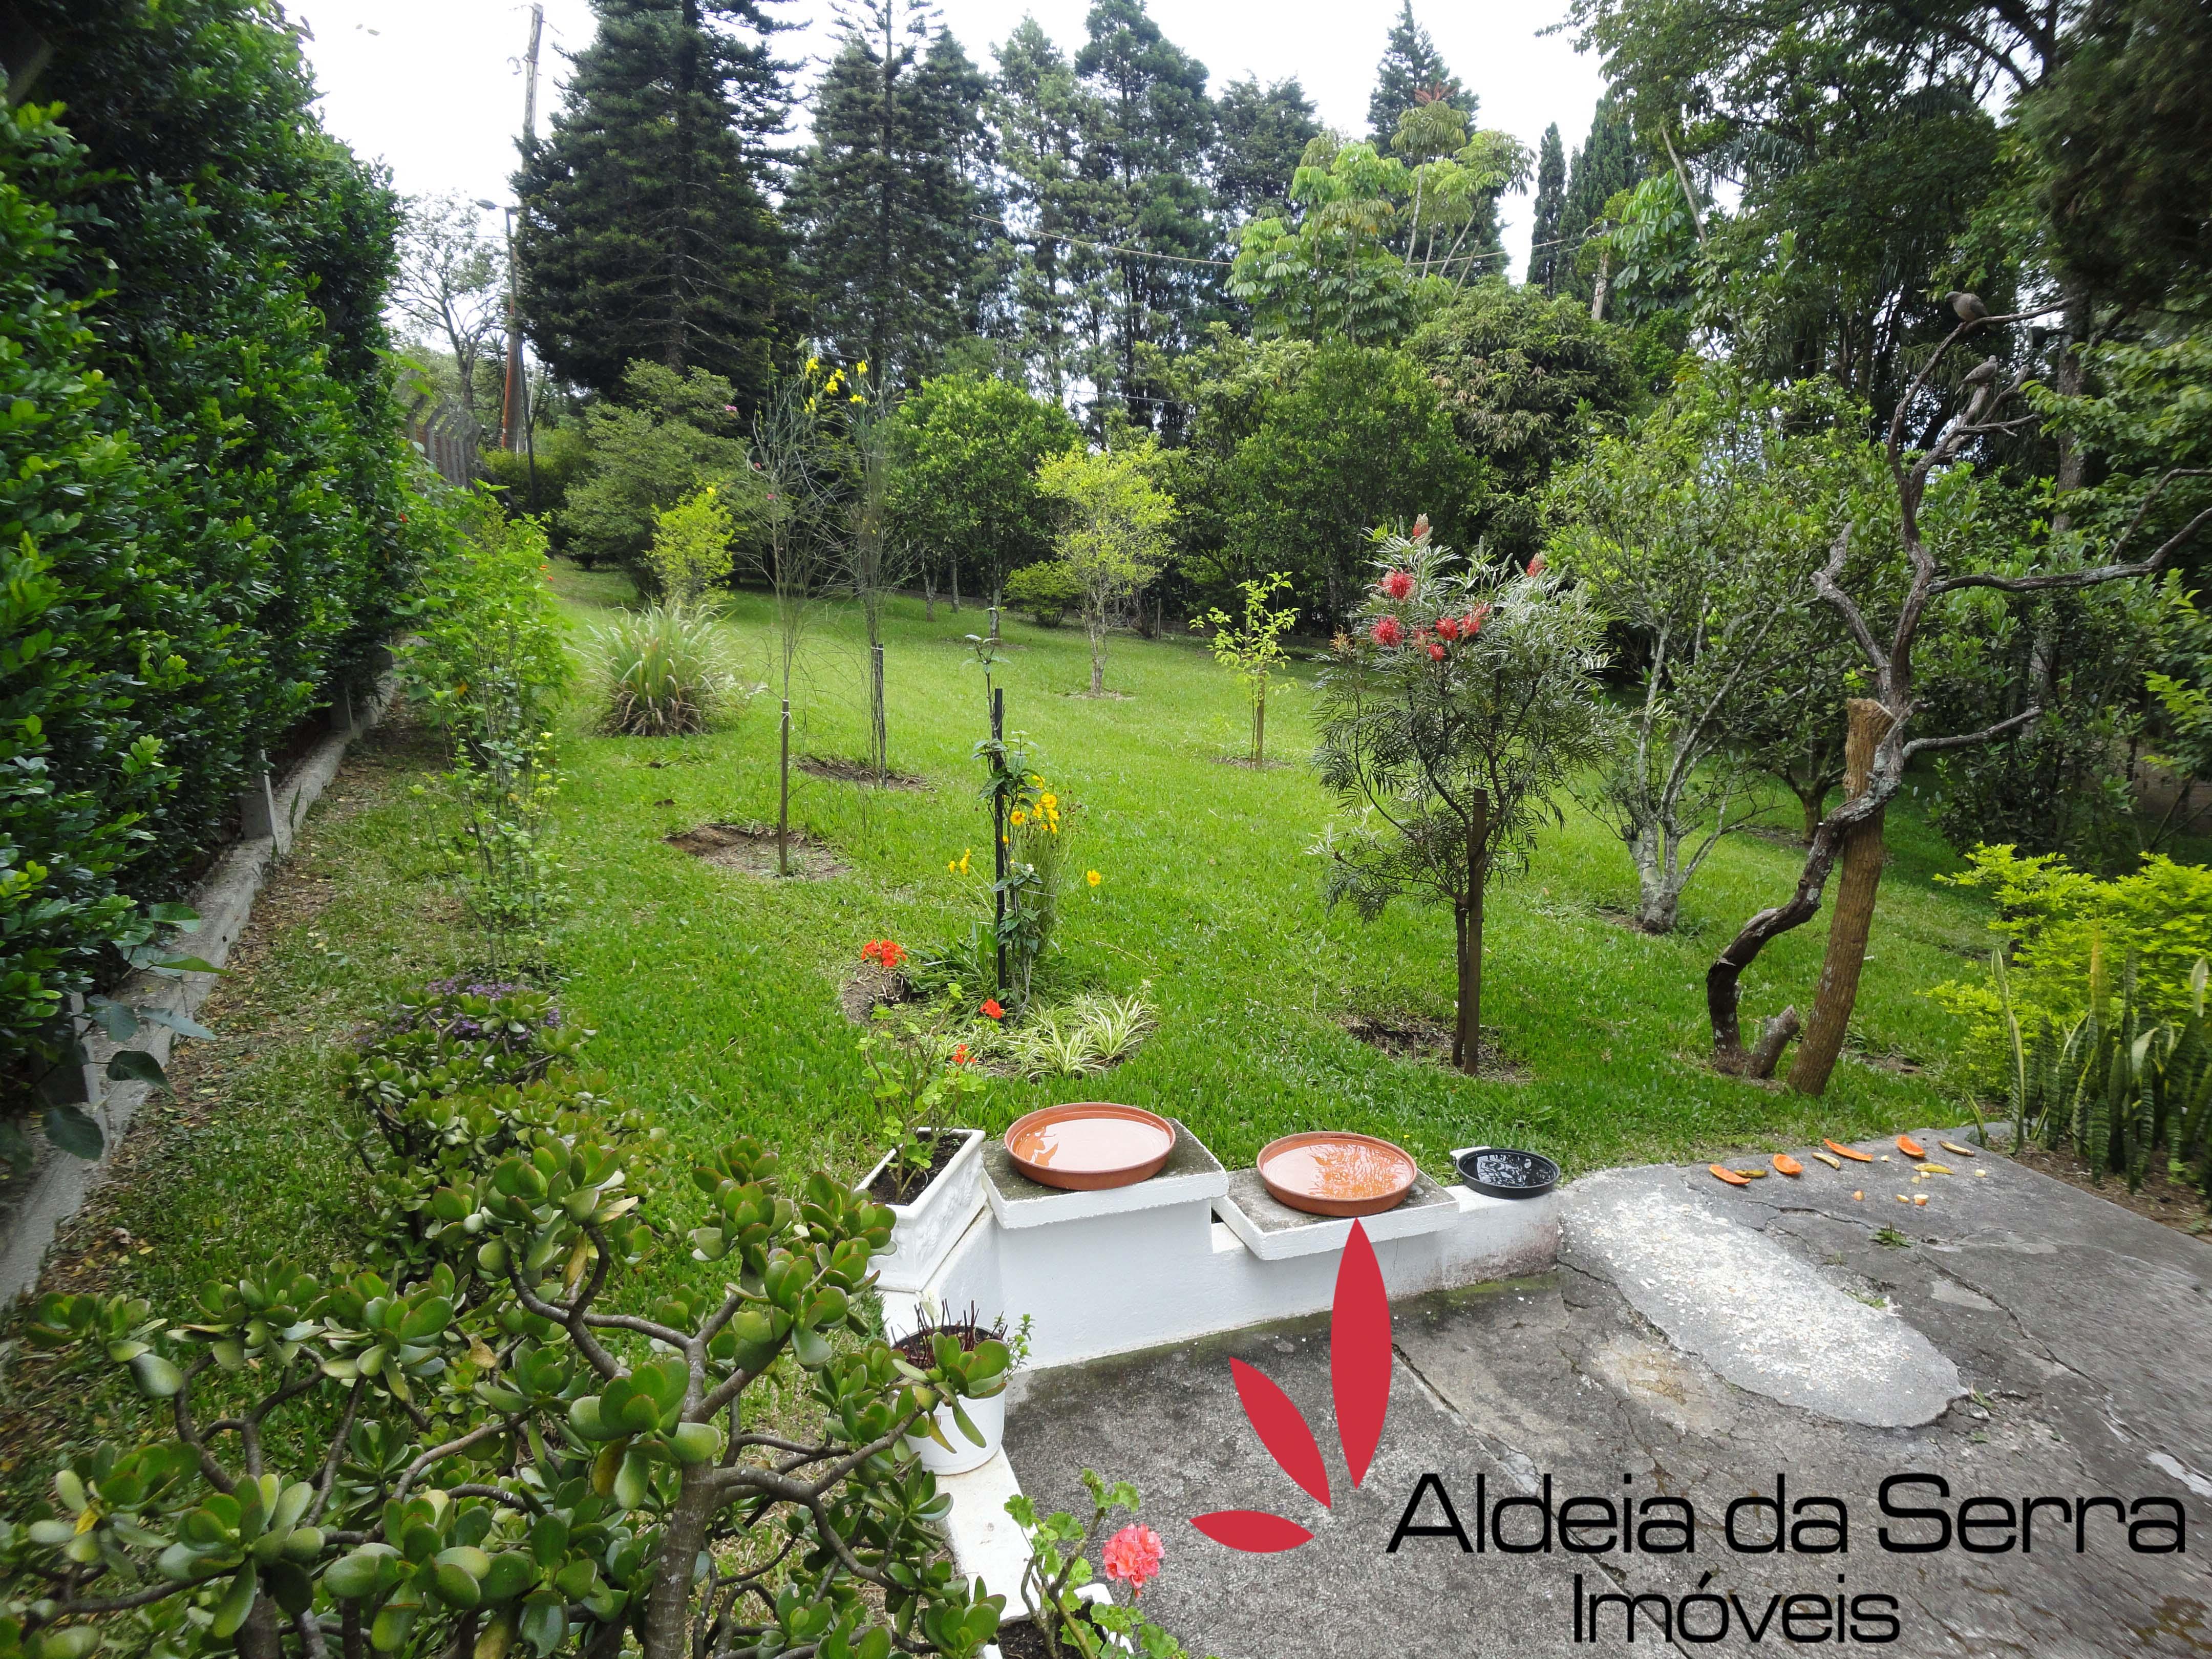 /admin/imoveis/fotos/DSC00024.JPG Aldeia da Serra Imoveis